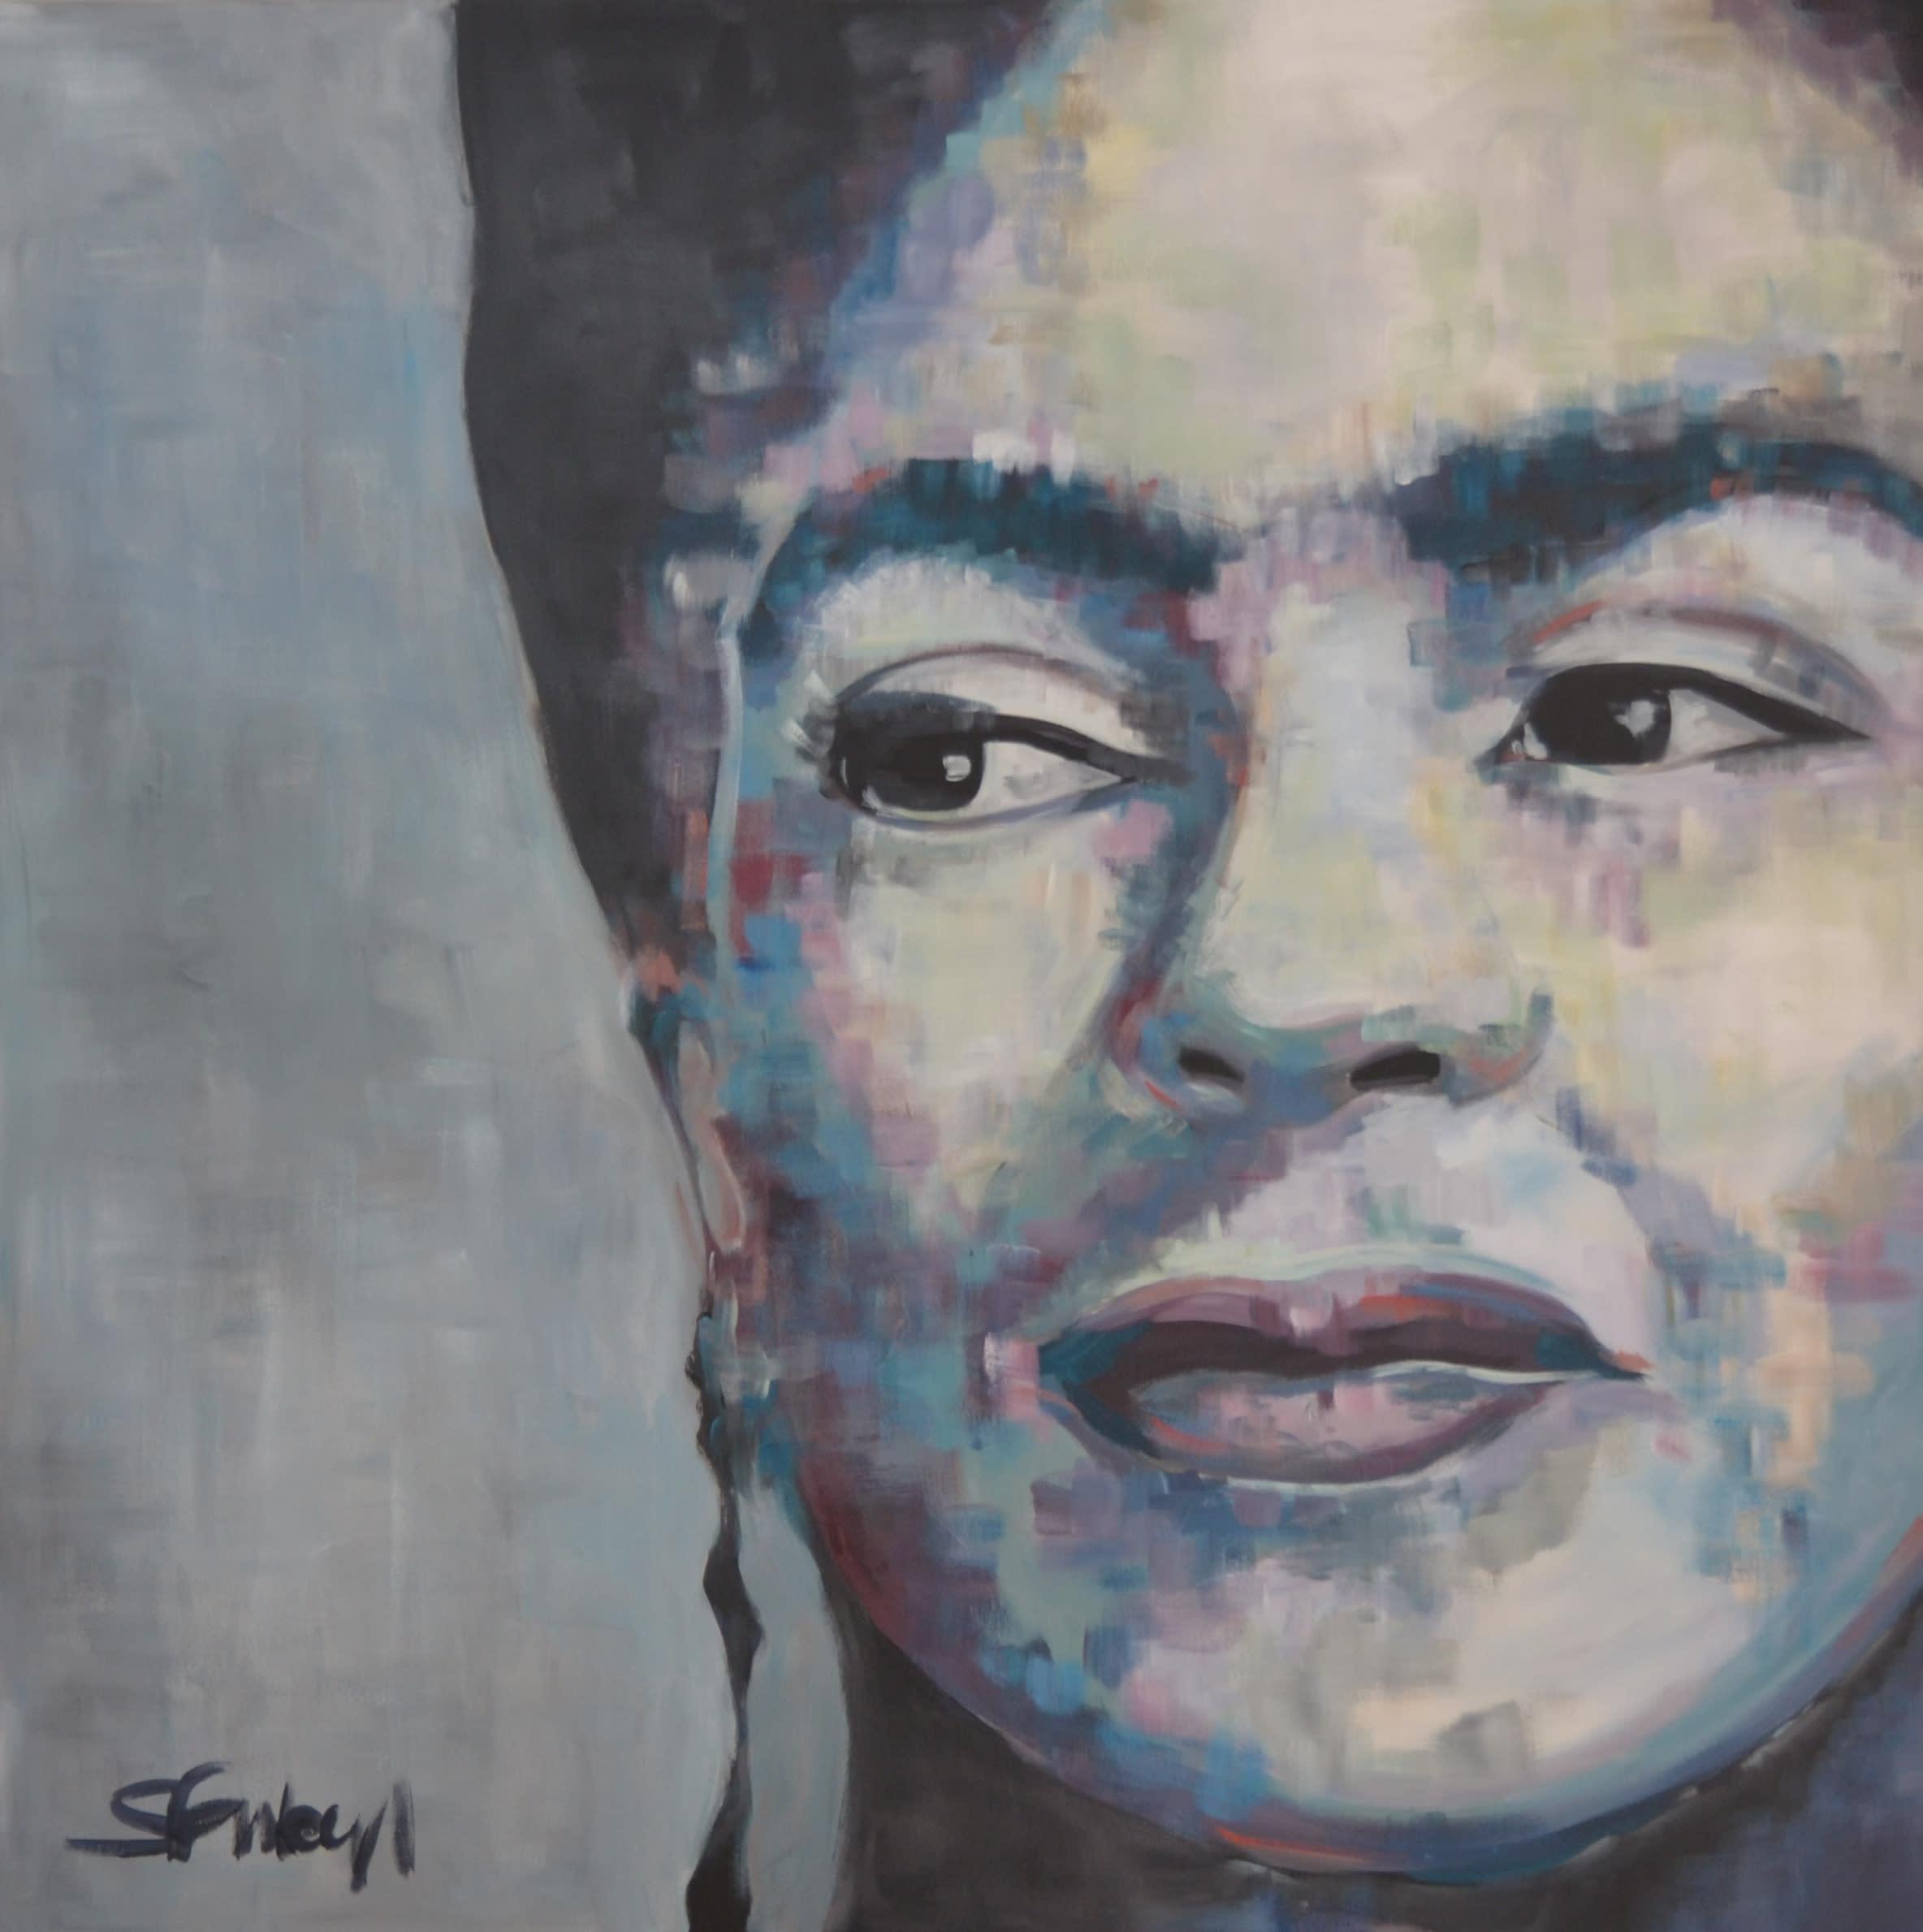 Frida kahlo zdshfq